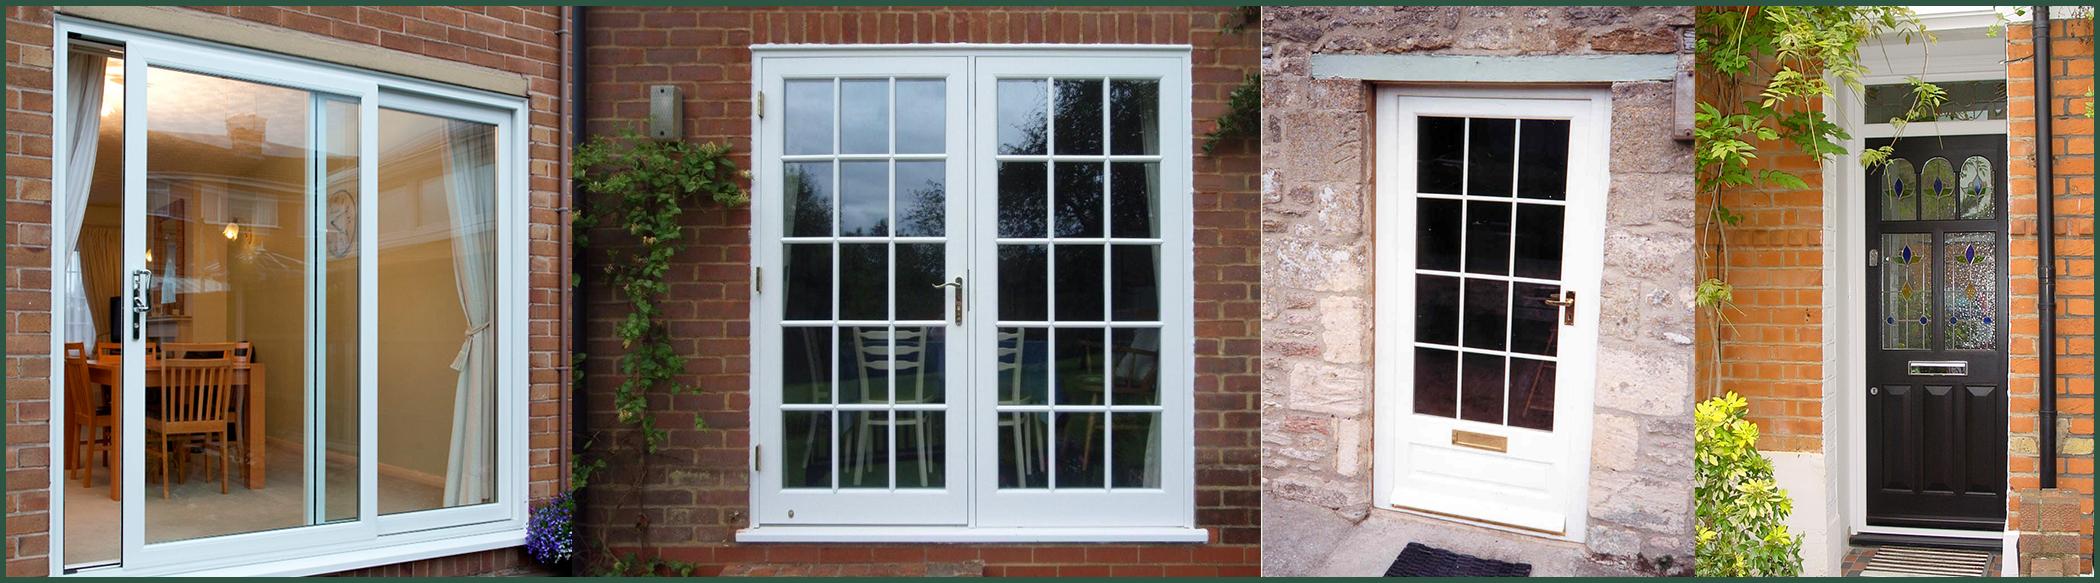 grovewood windows doors liss petersfield godalming